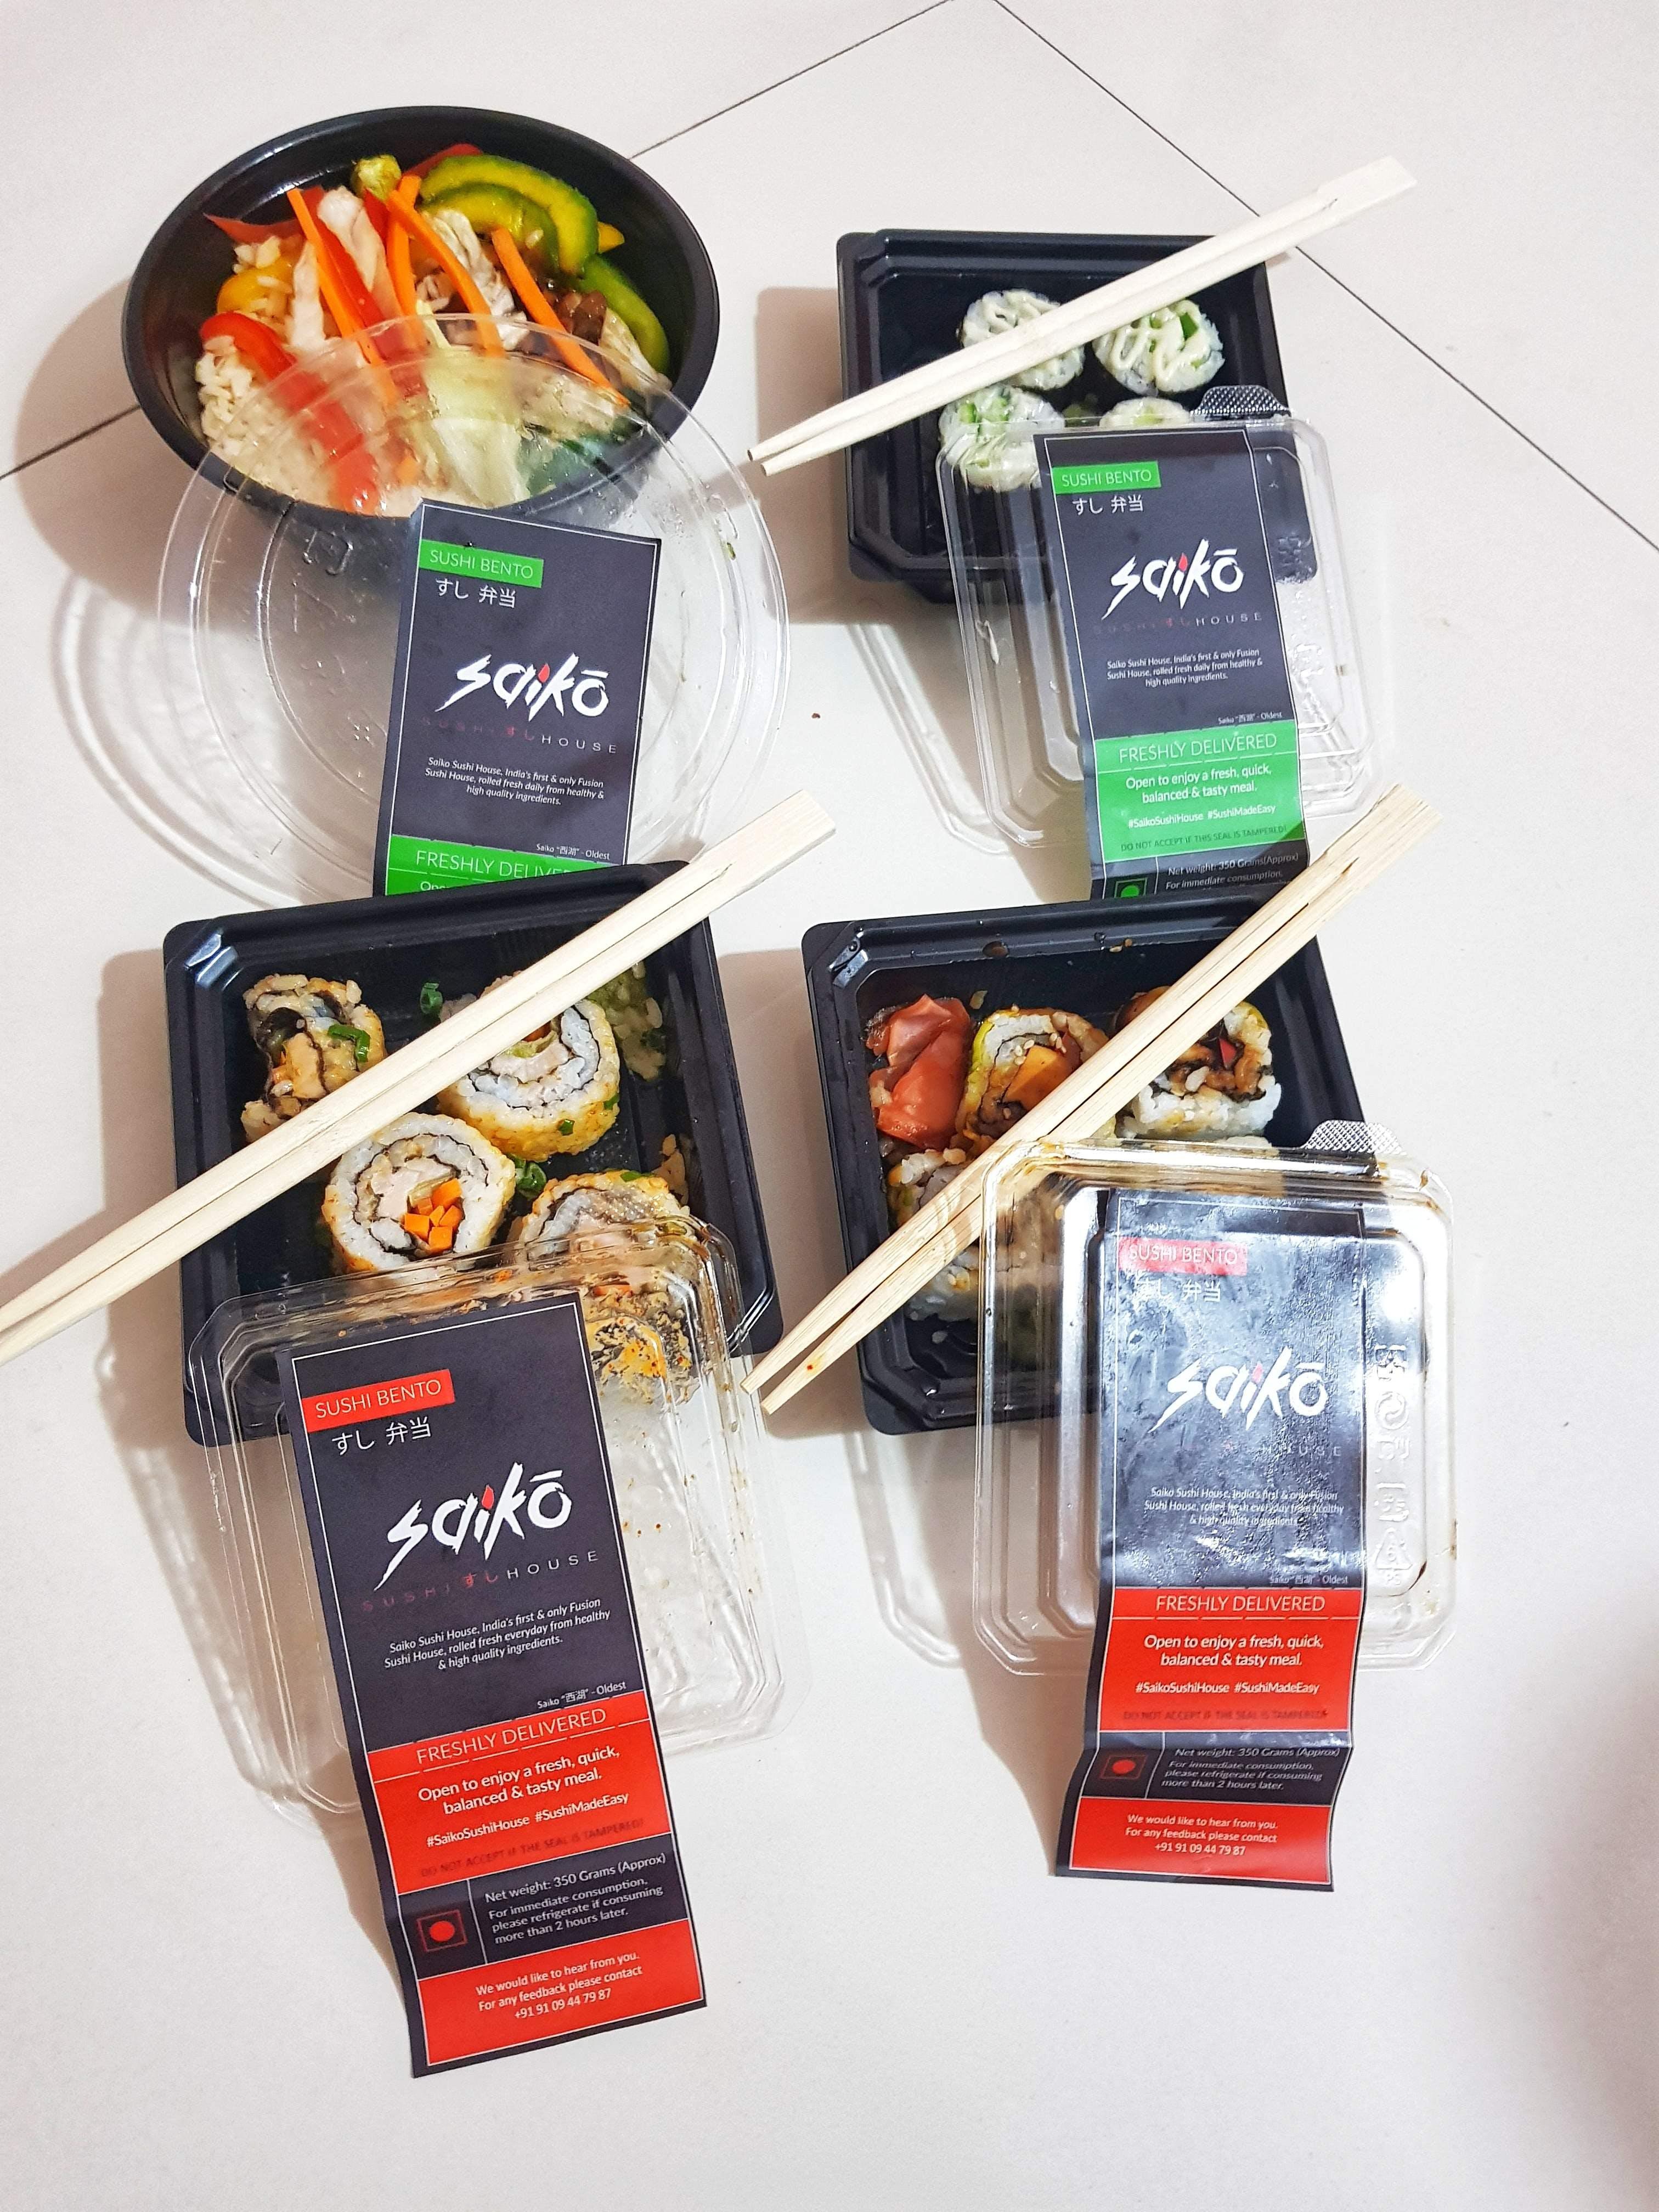 Food,Dish,Cuisine,Finger food,Vegetarian food,Snack,Side dish,Brand